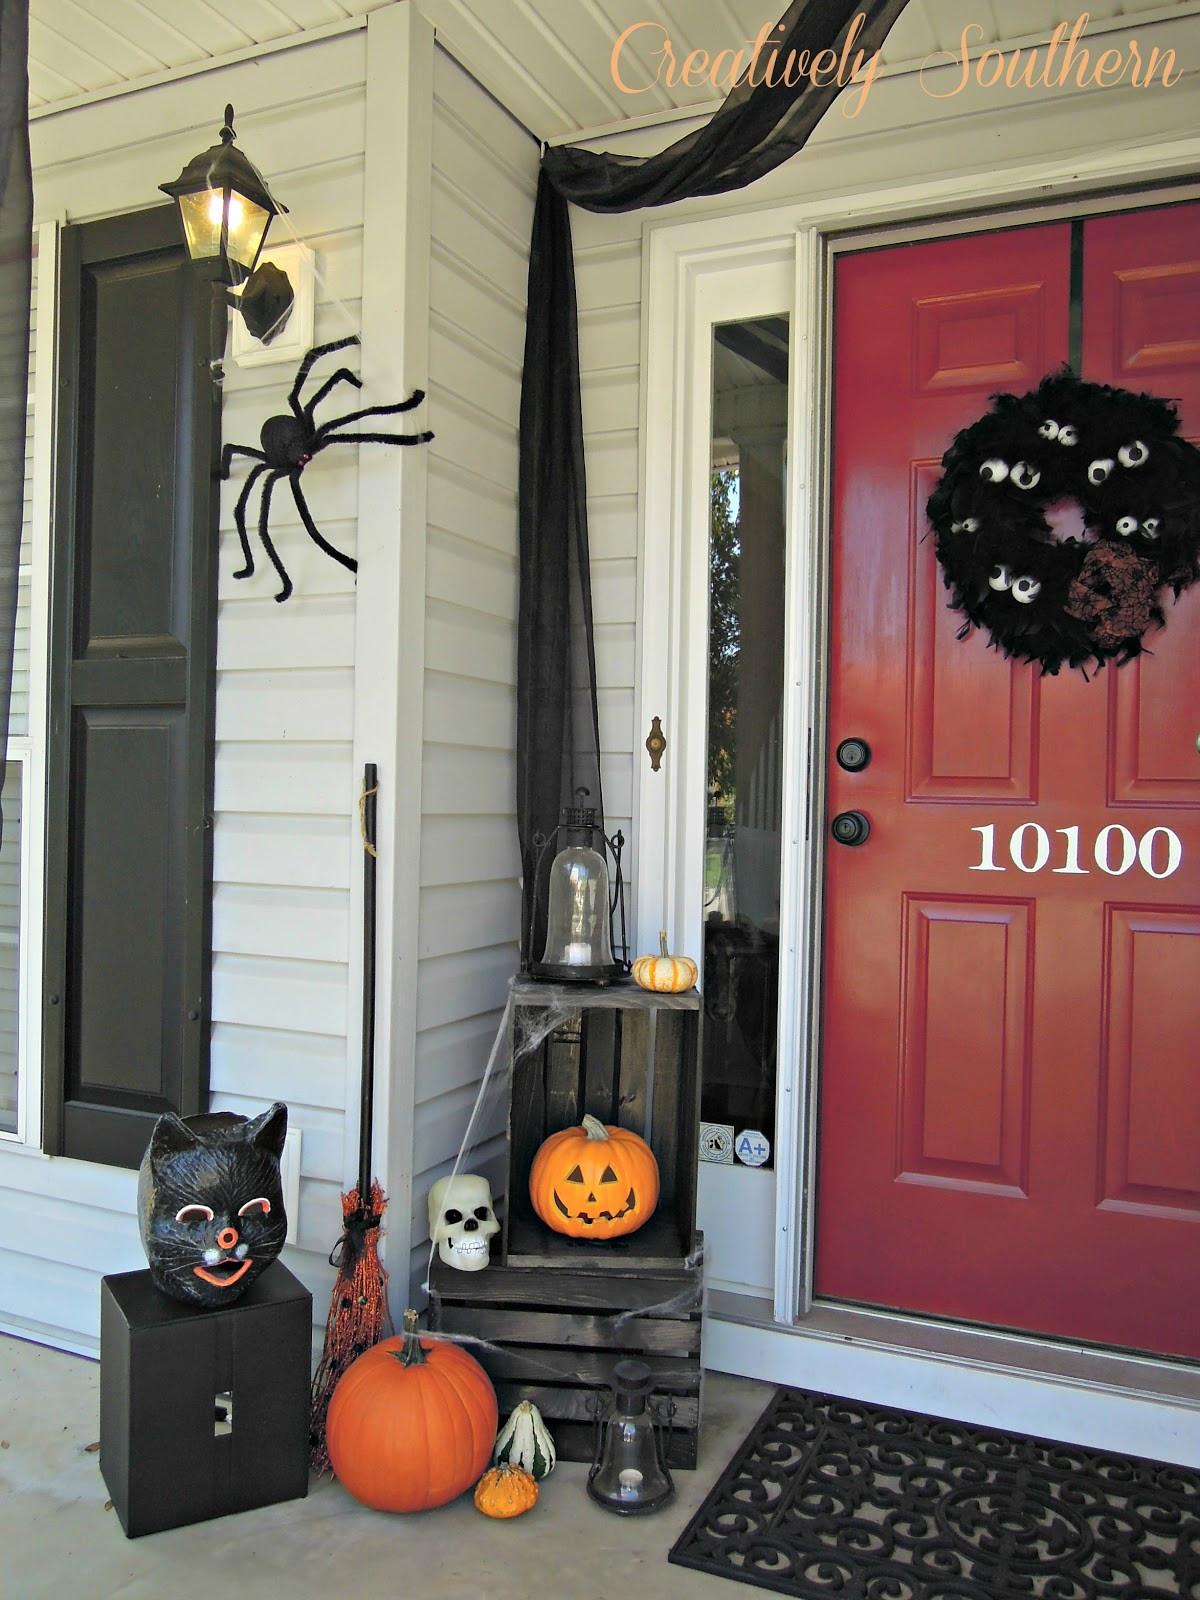 Porch Decorations For Halloween  Halloween Porch Ideas